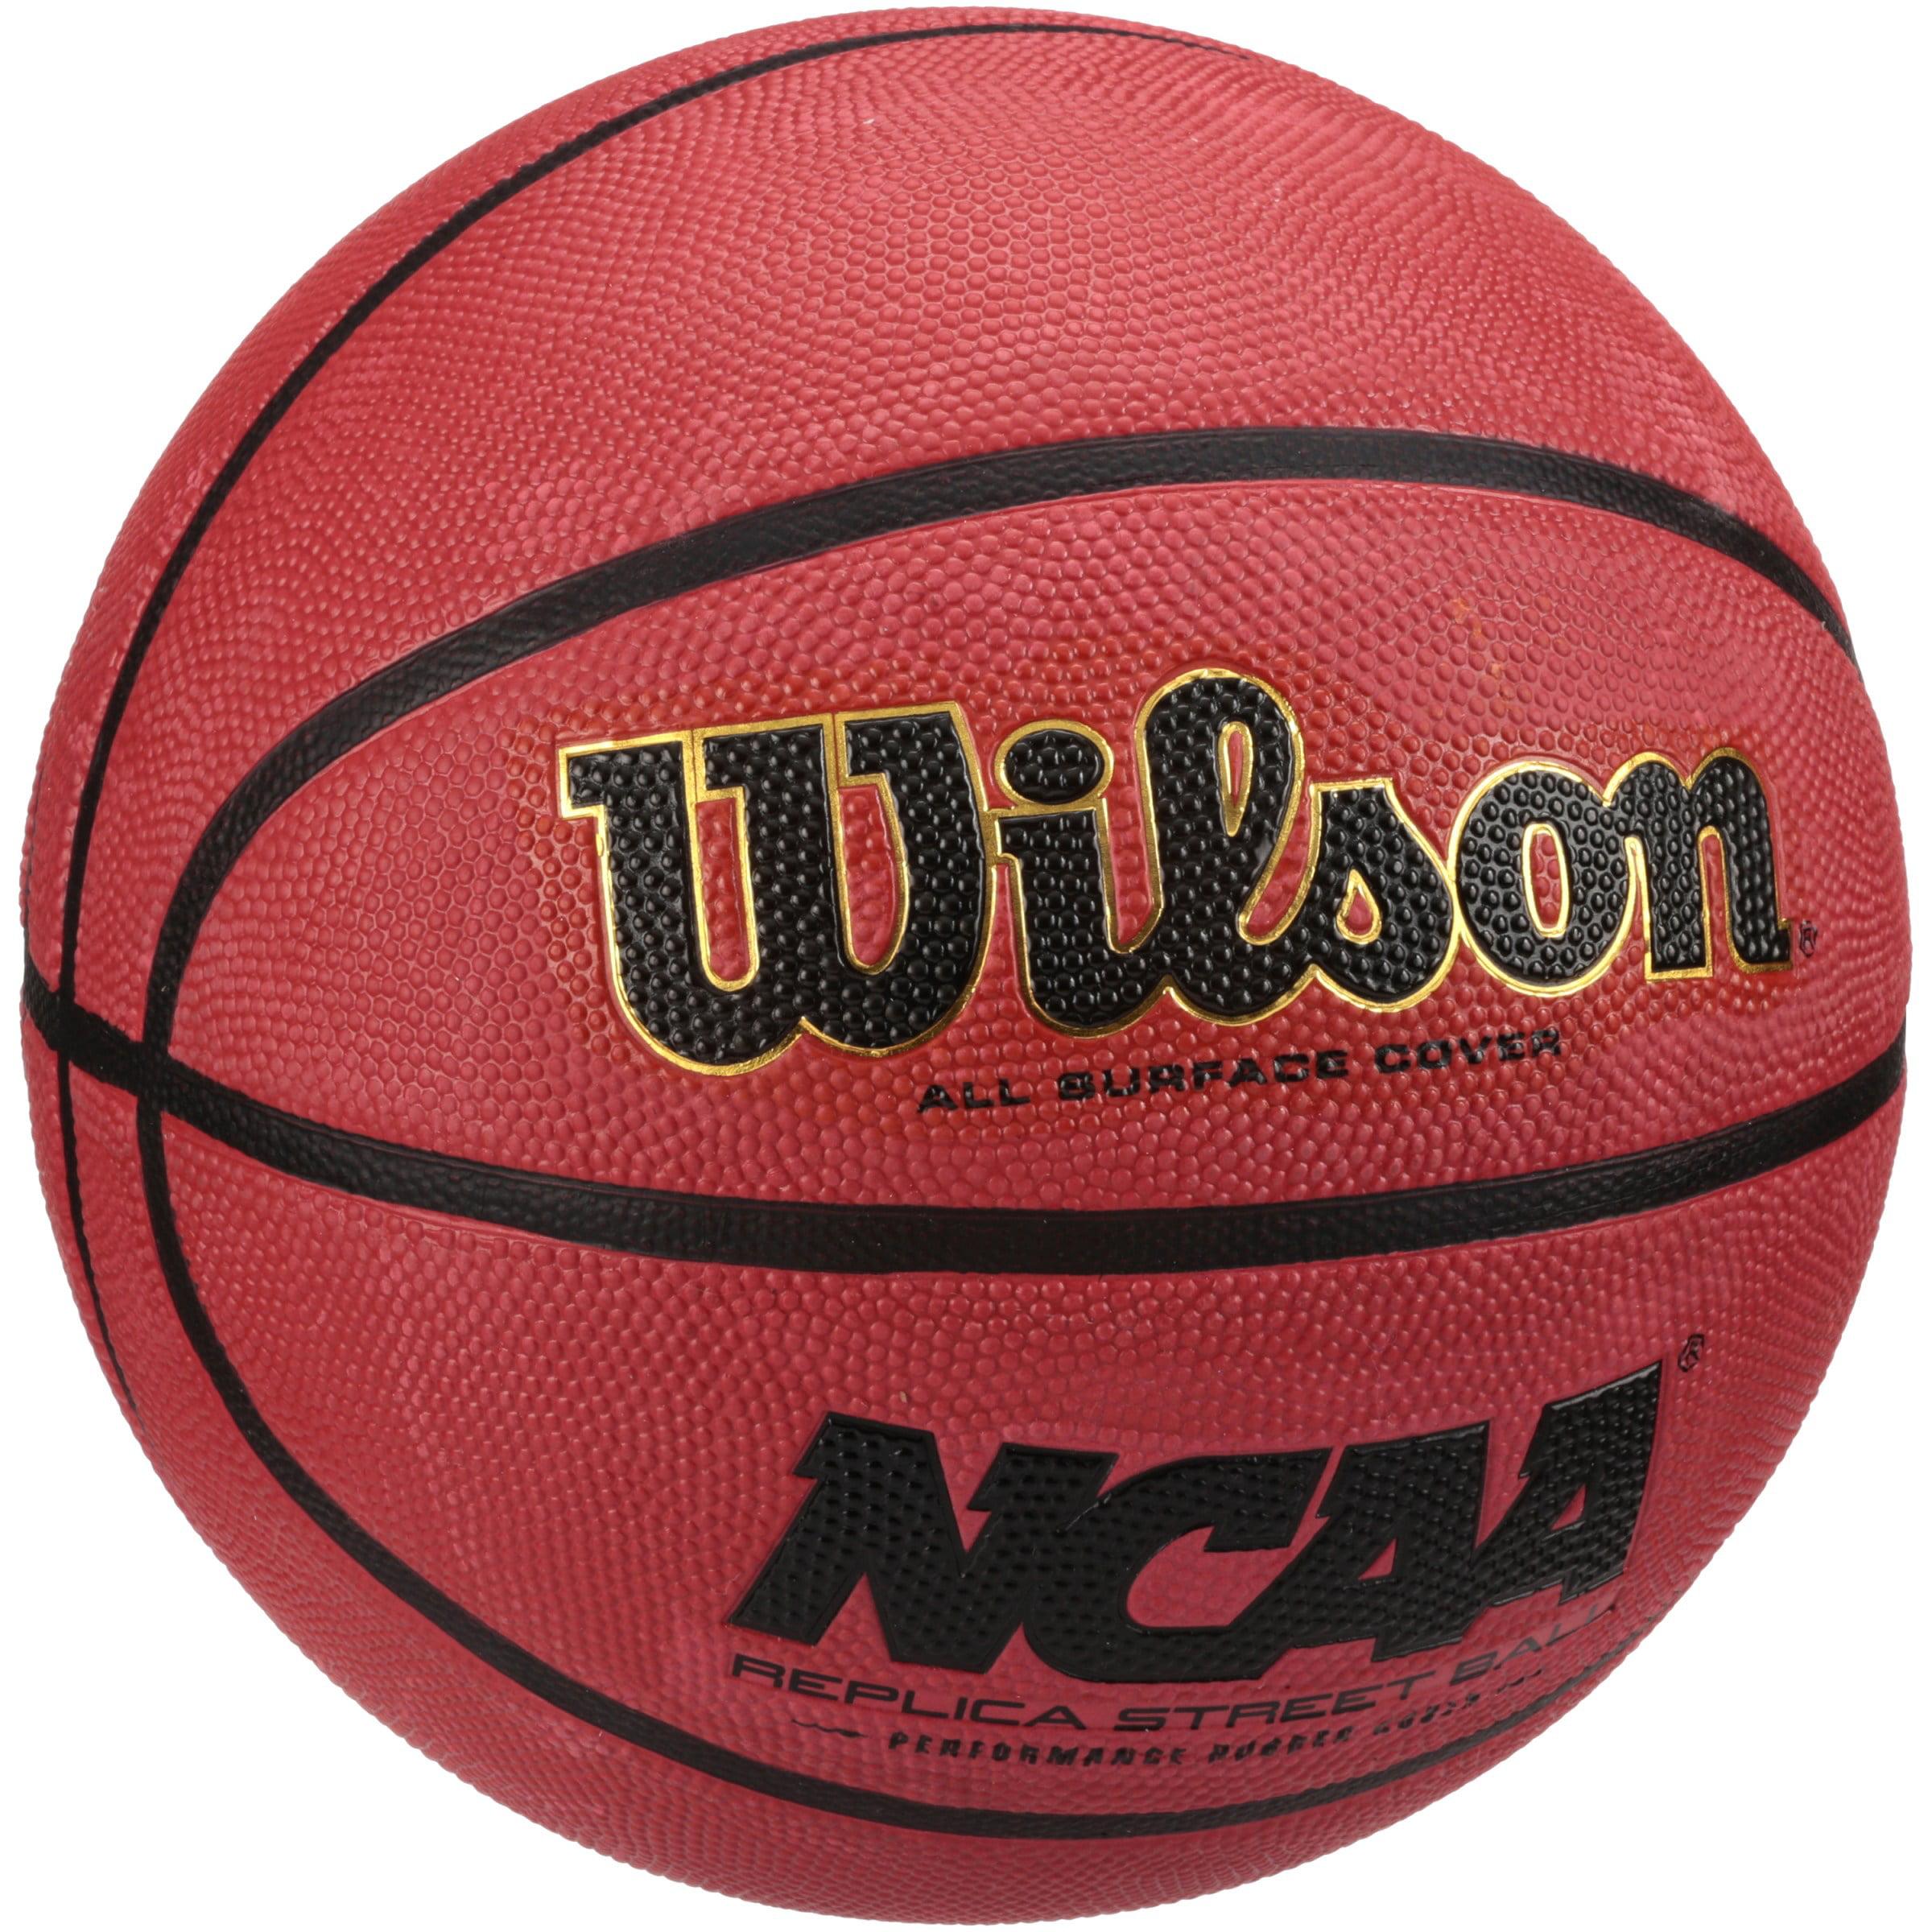 "Wilson NCAA Street Replica 29.5"" Basketball by Wilson Sporting Goods Co."